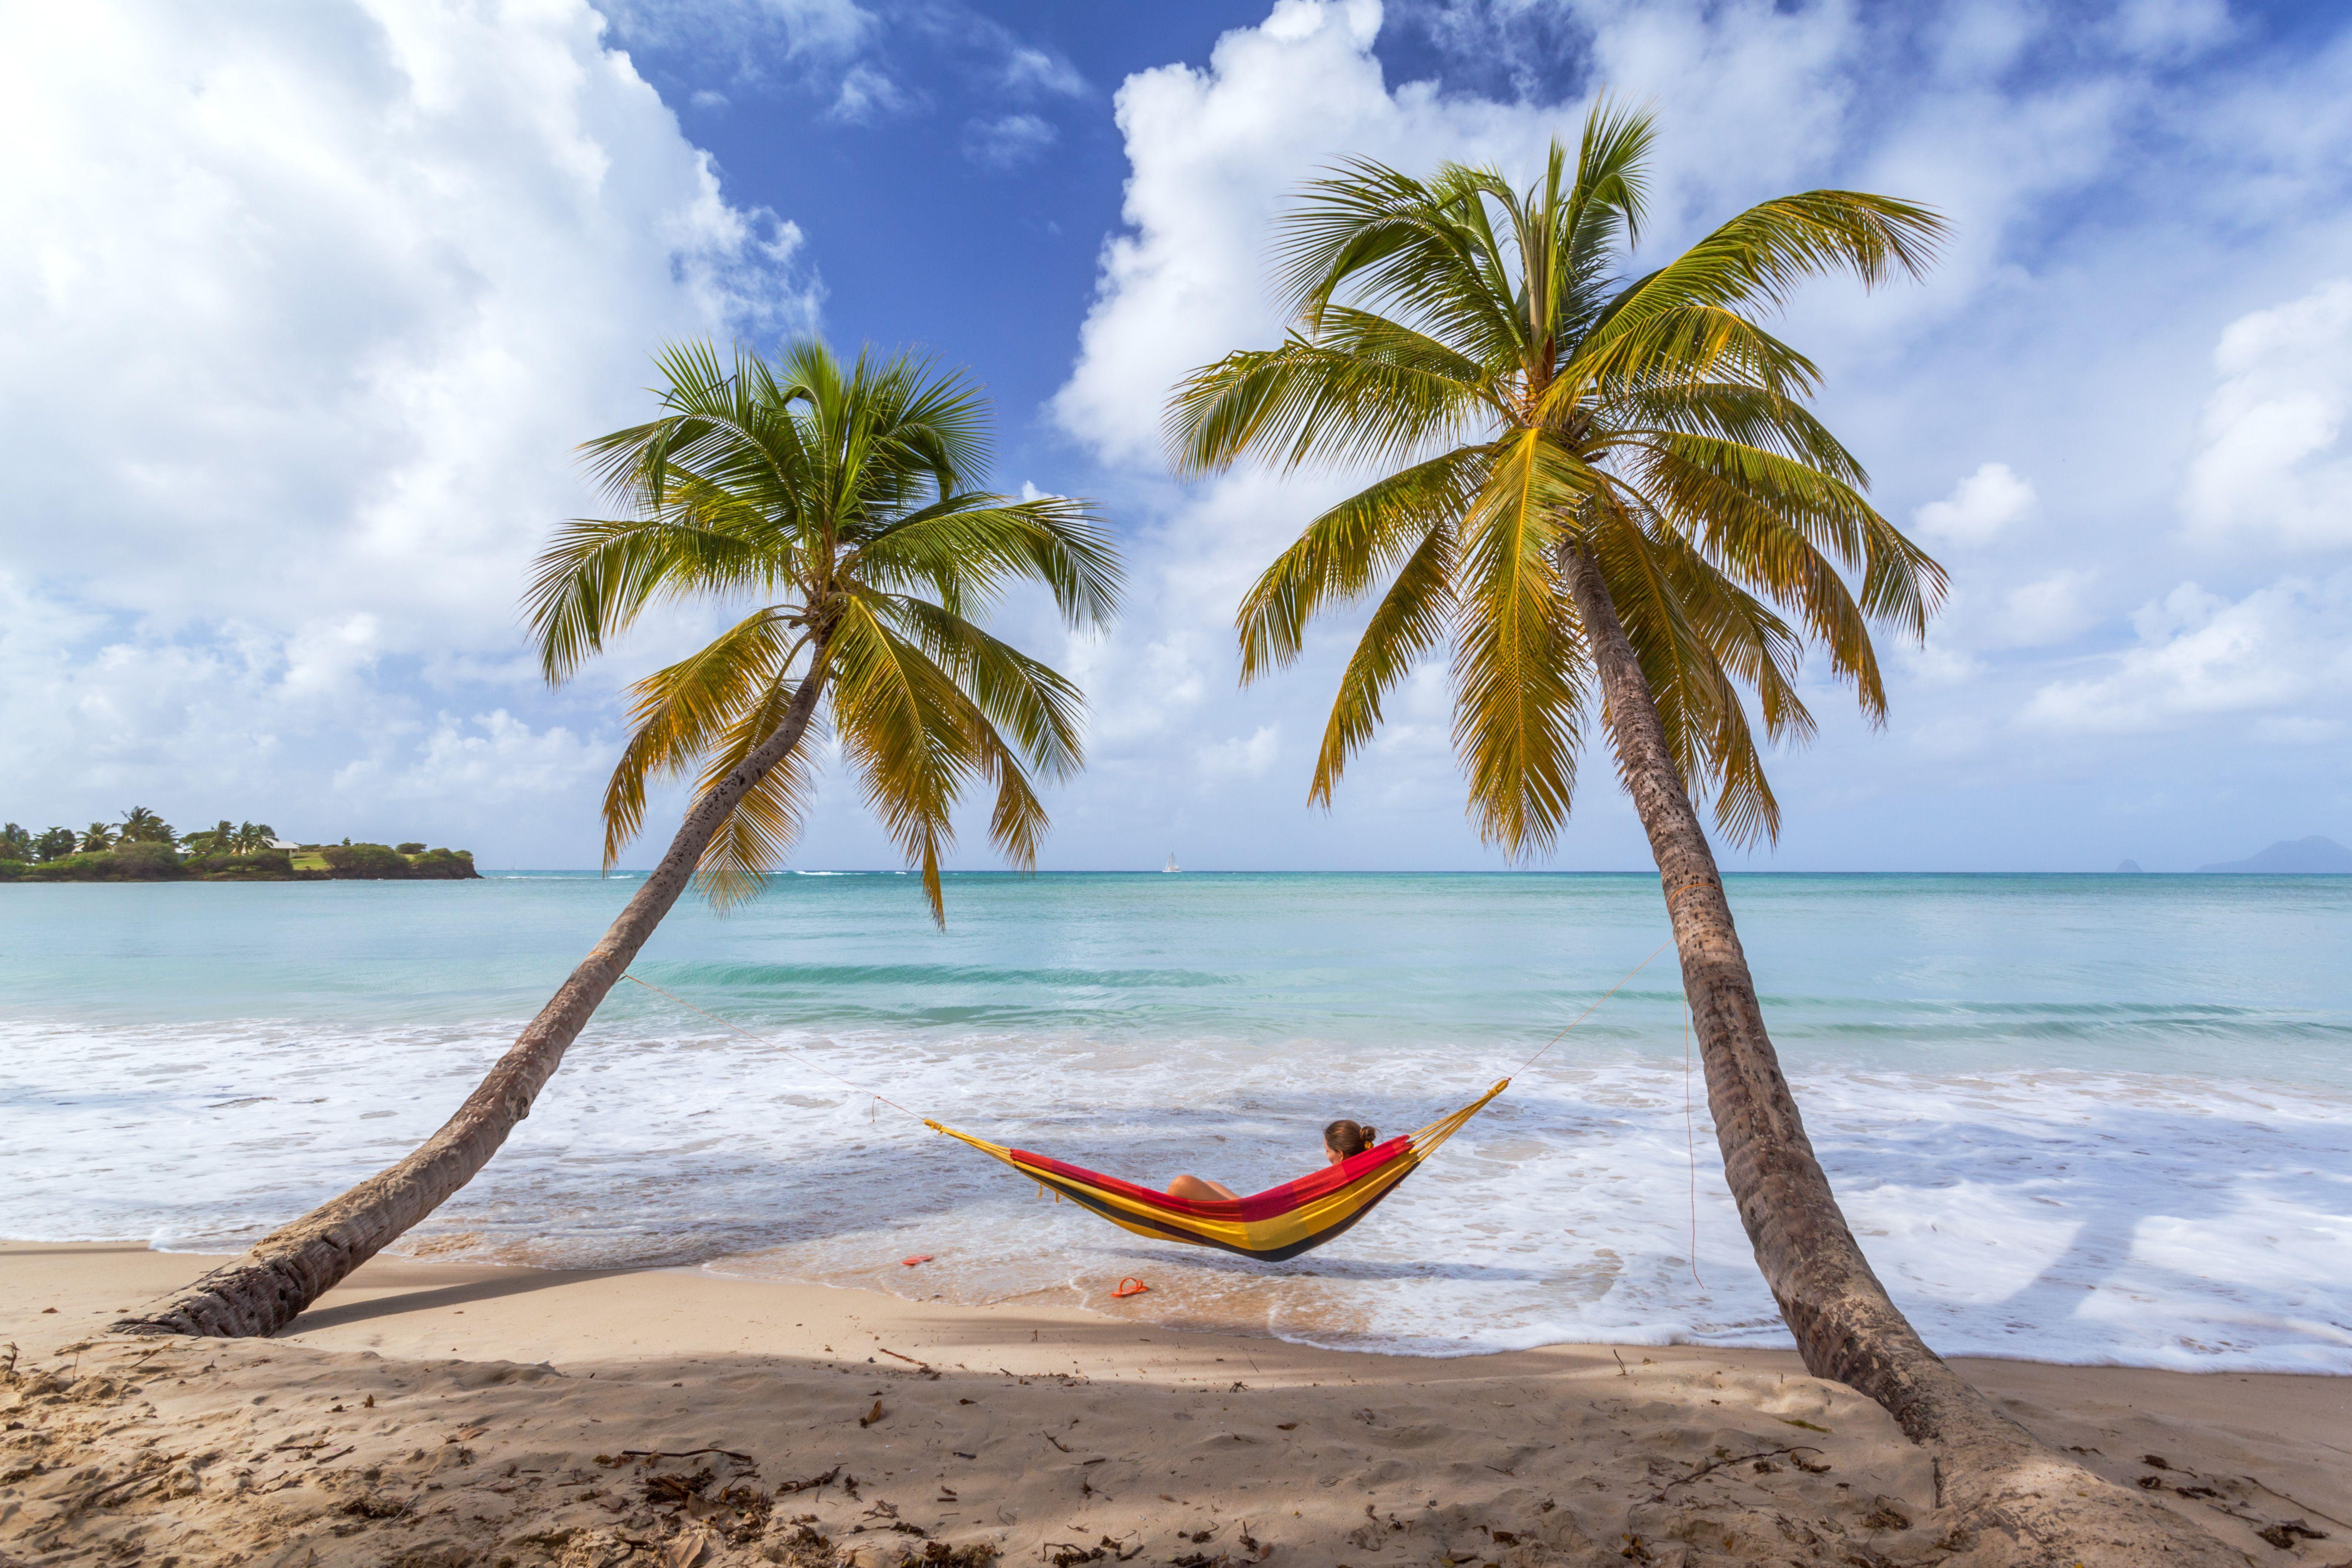 Woman lying on hammock between palm trees at beach